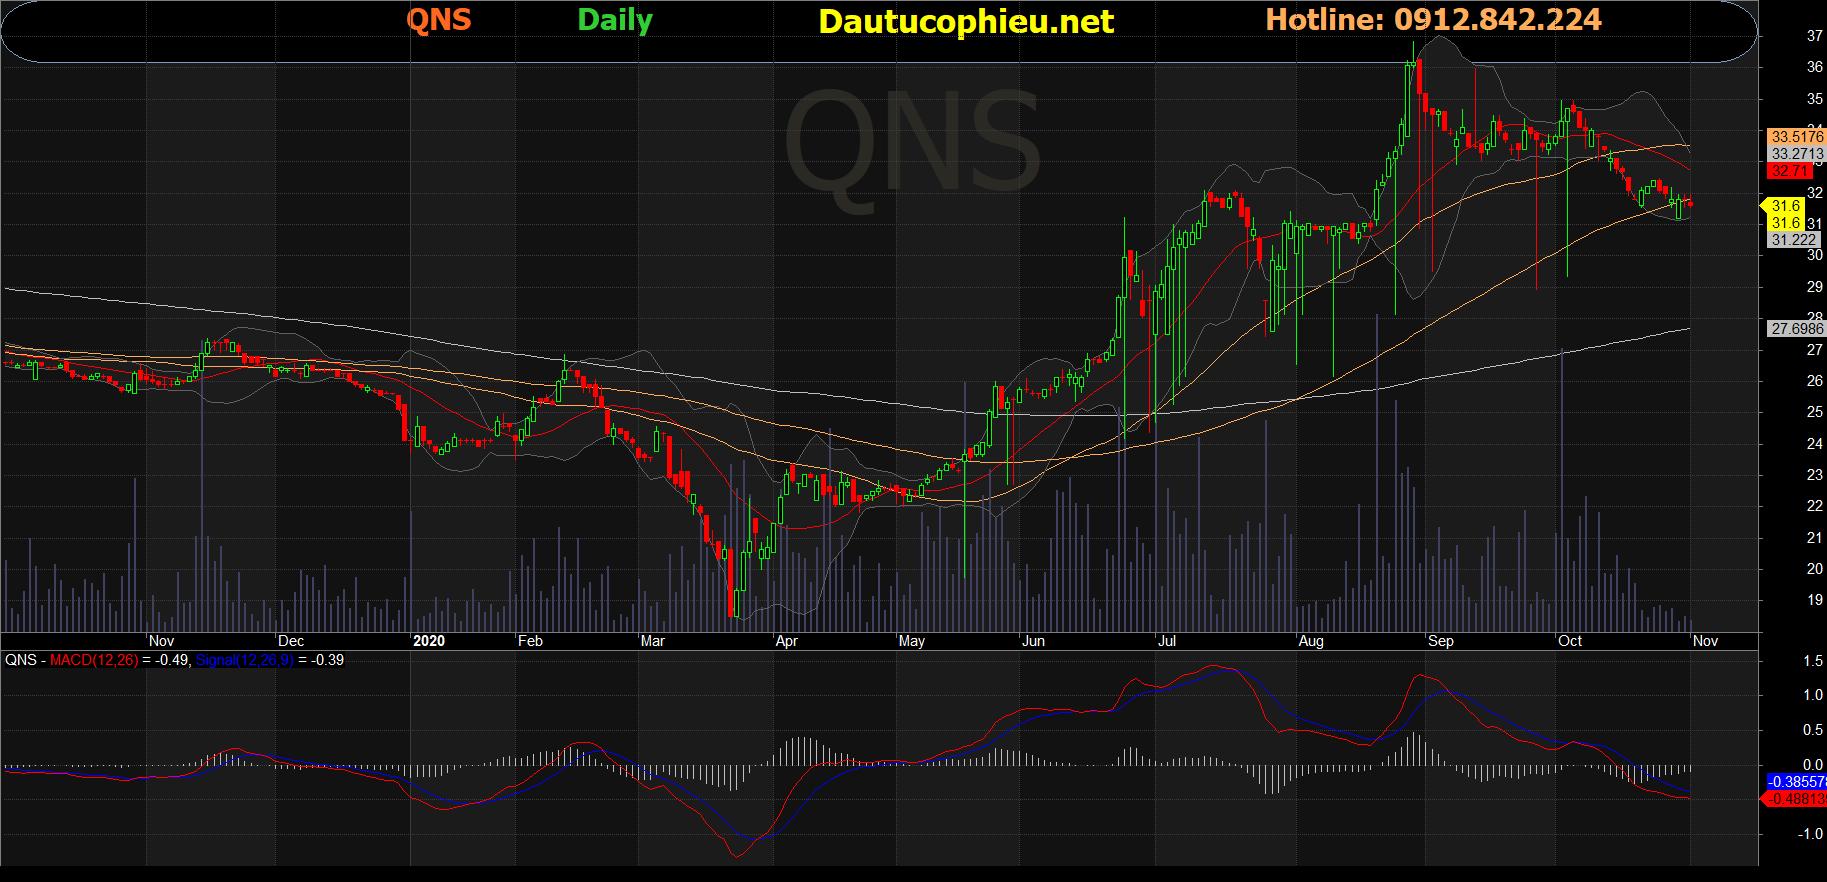 Cổ phiếu QNS